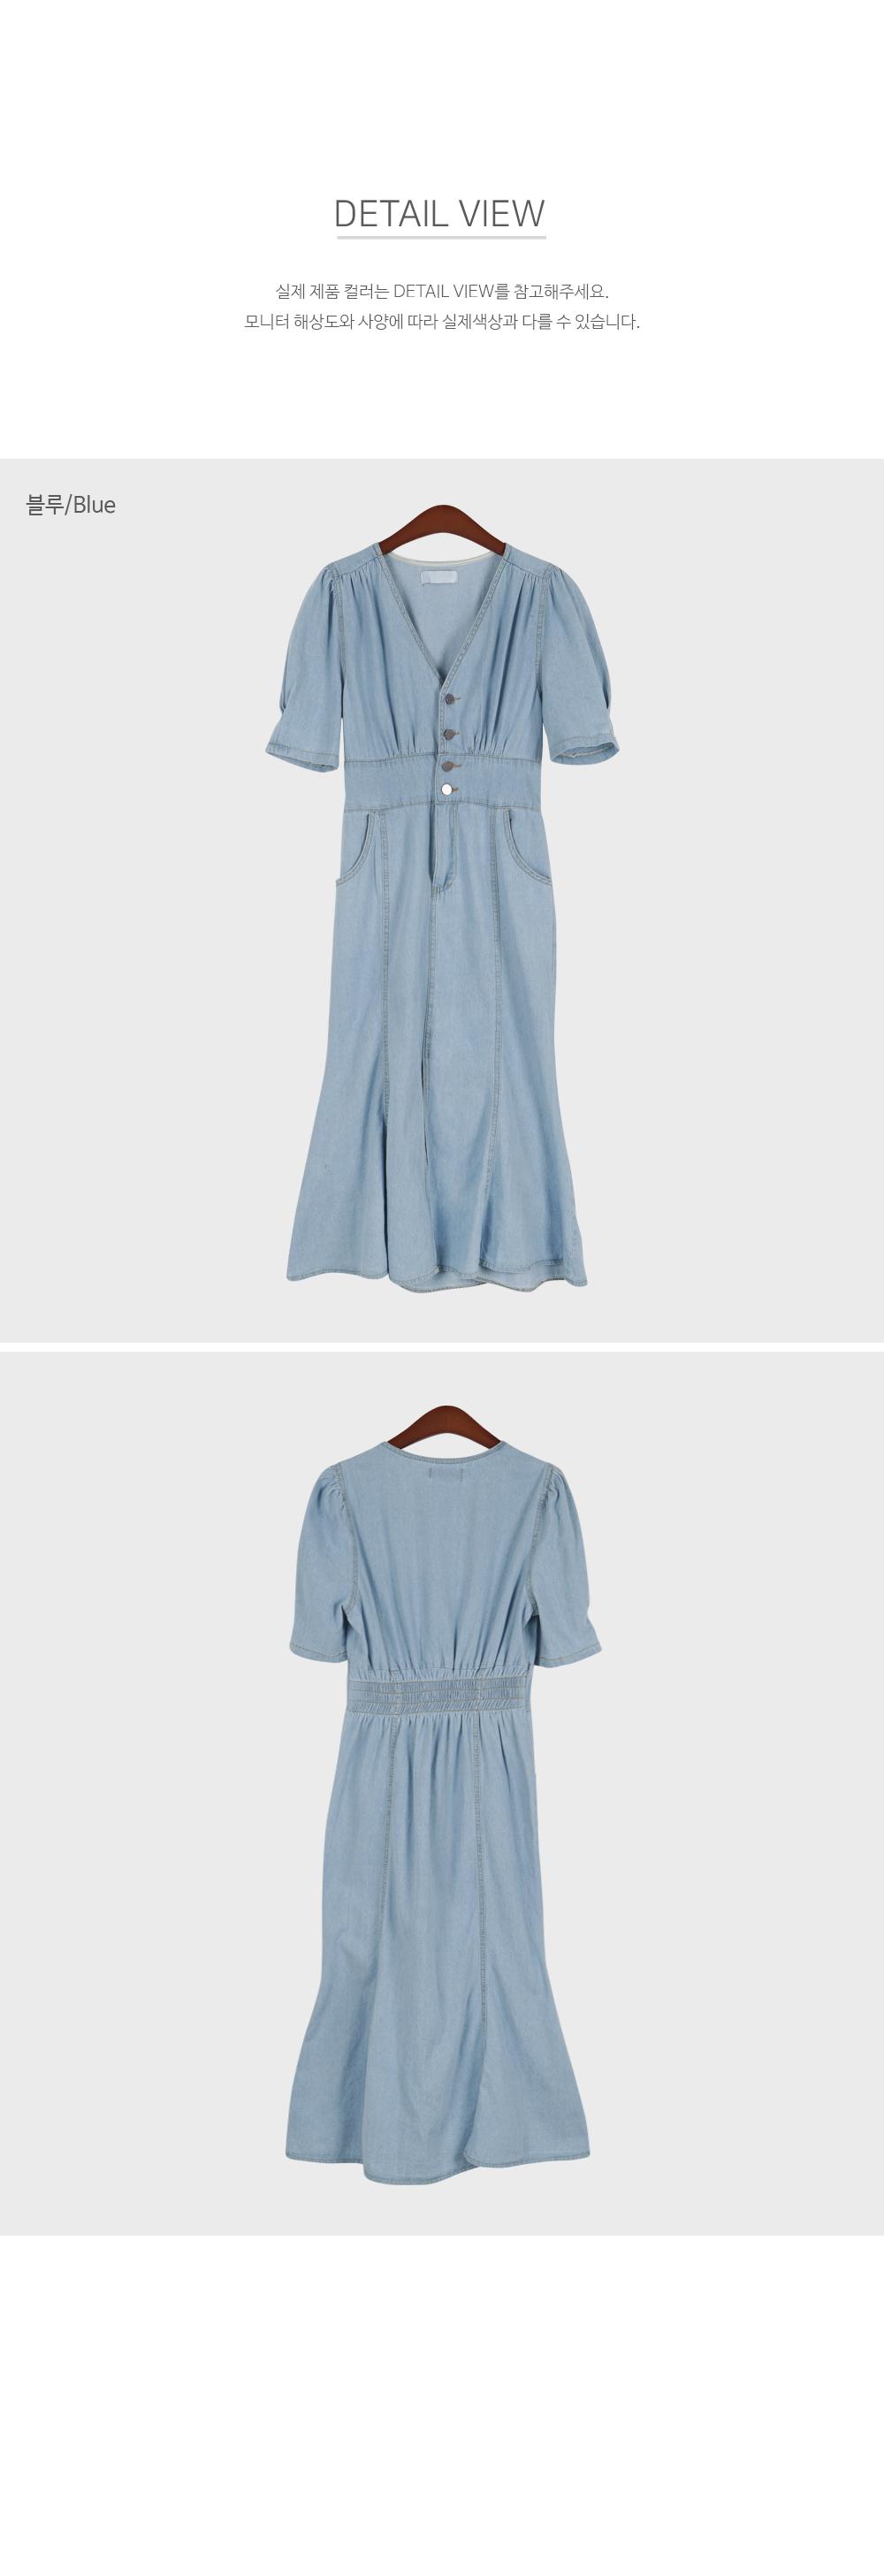 Puff Sleeve Mermaid Denim Dress-holiholic.com